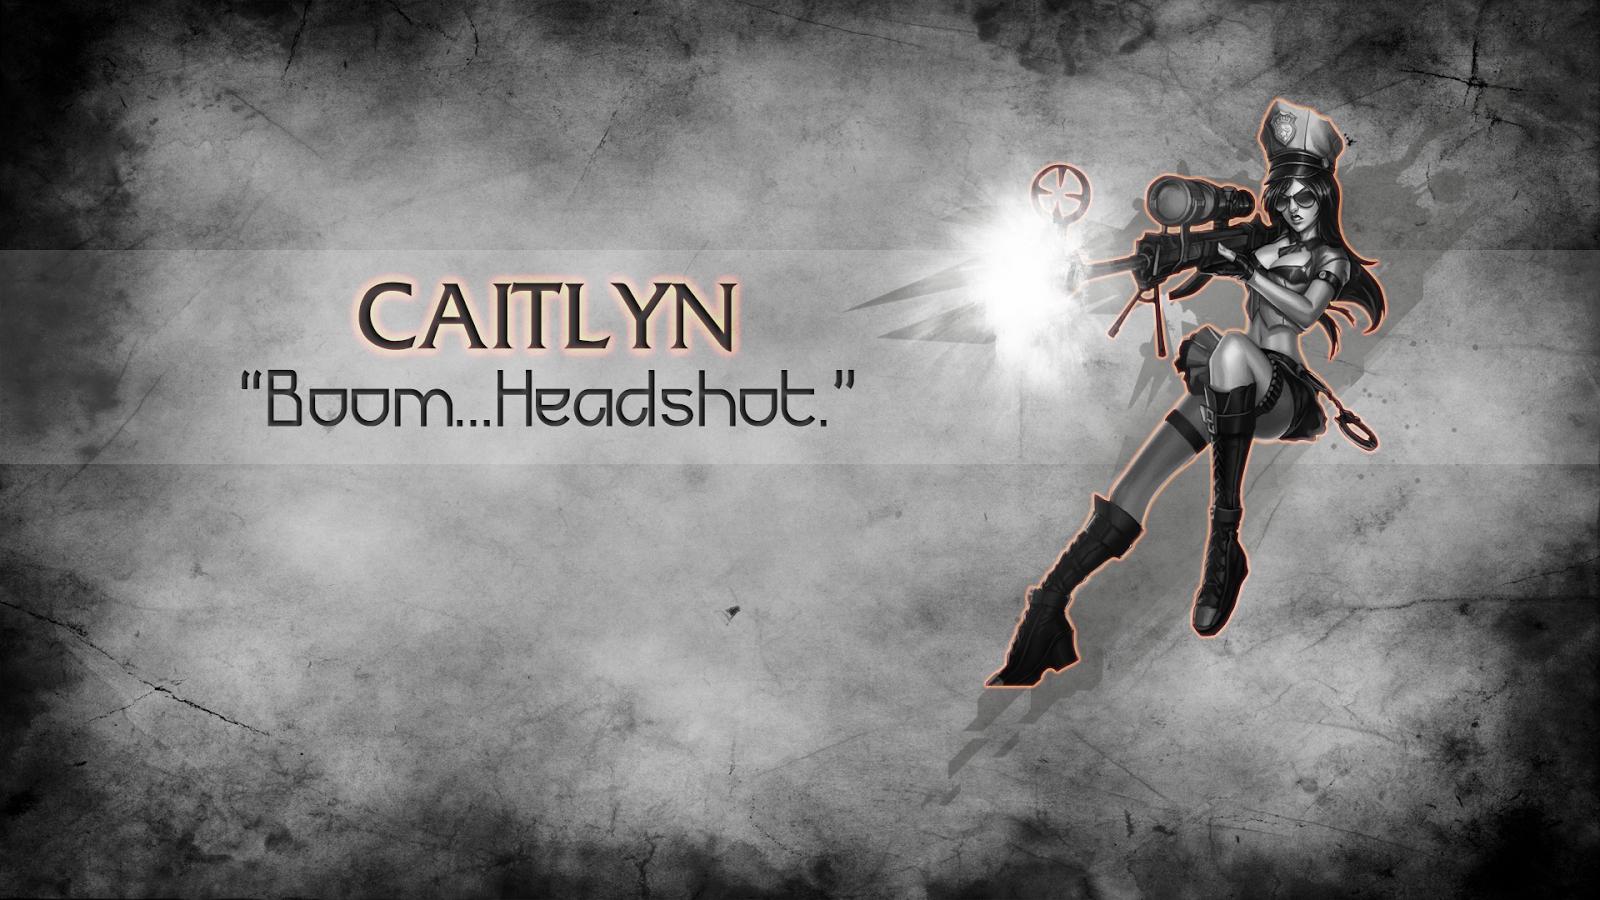 Caitlyn League of Legends Wallpaper, Caitlyn Desktop Wallpaper